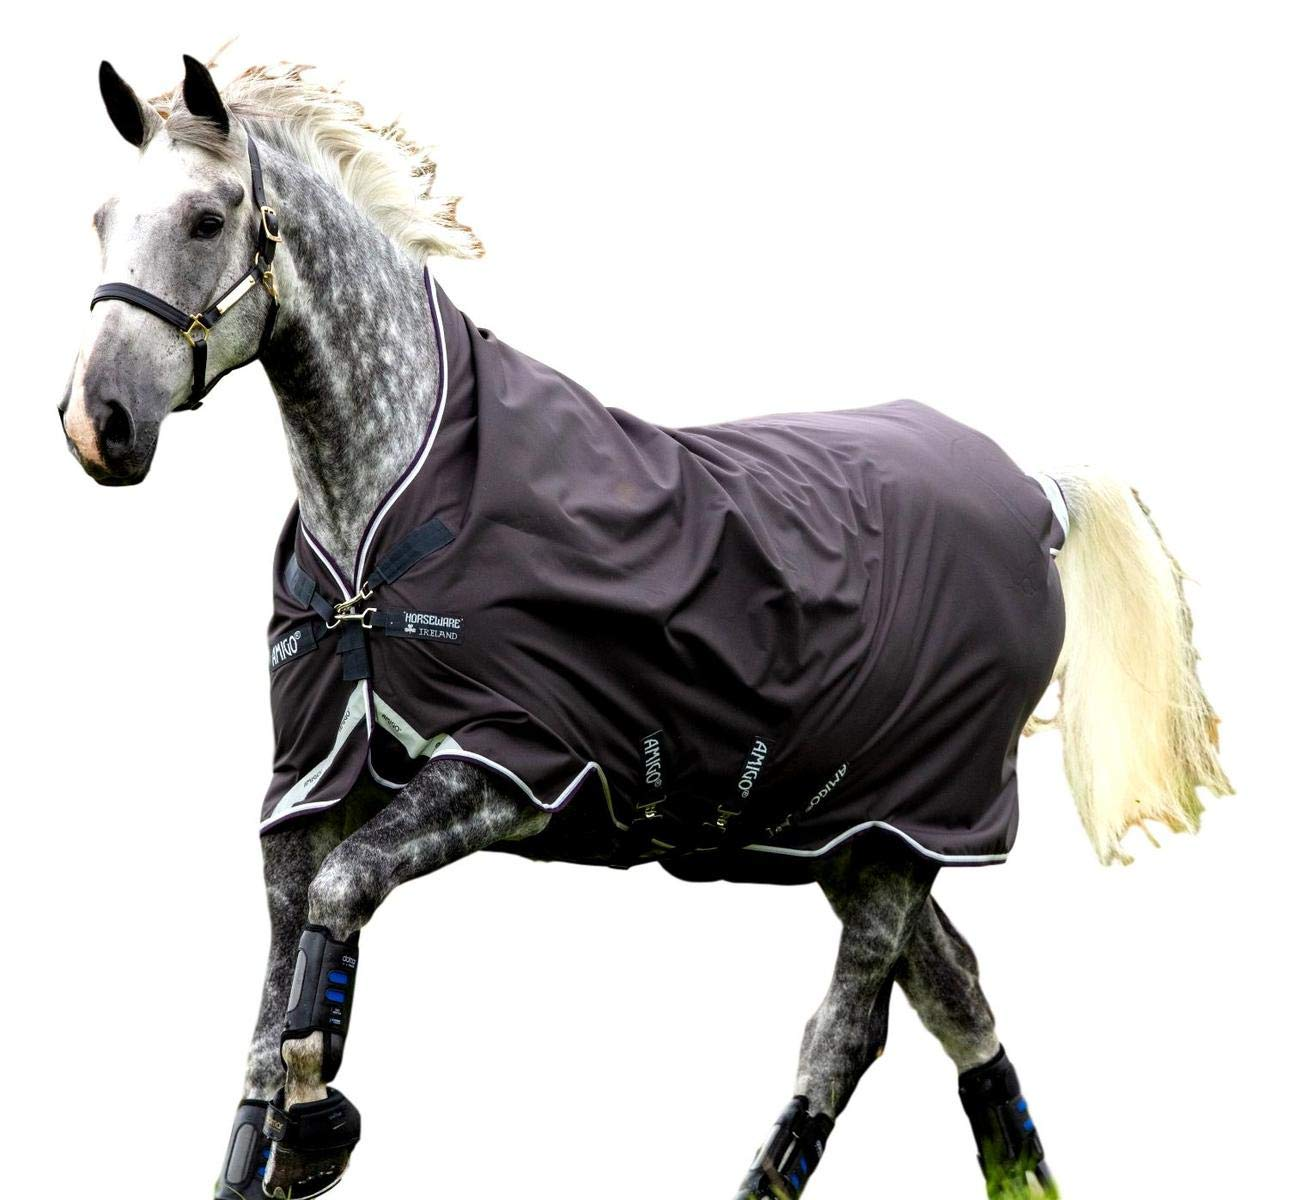 Horseware Amigo Bravo 12 Wug Turnout Sheet Lite - Excalibur/Plum/White/Silver, 81 by Horseware